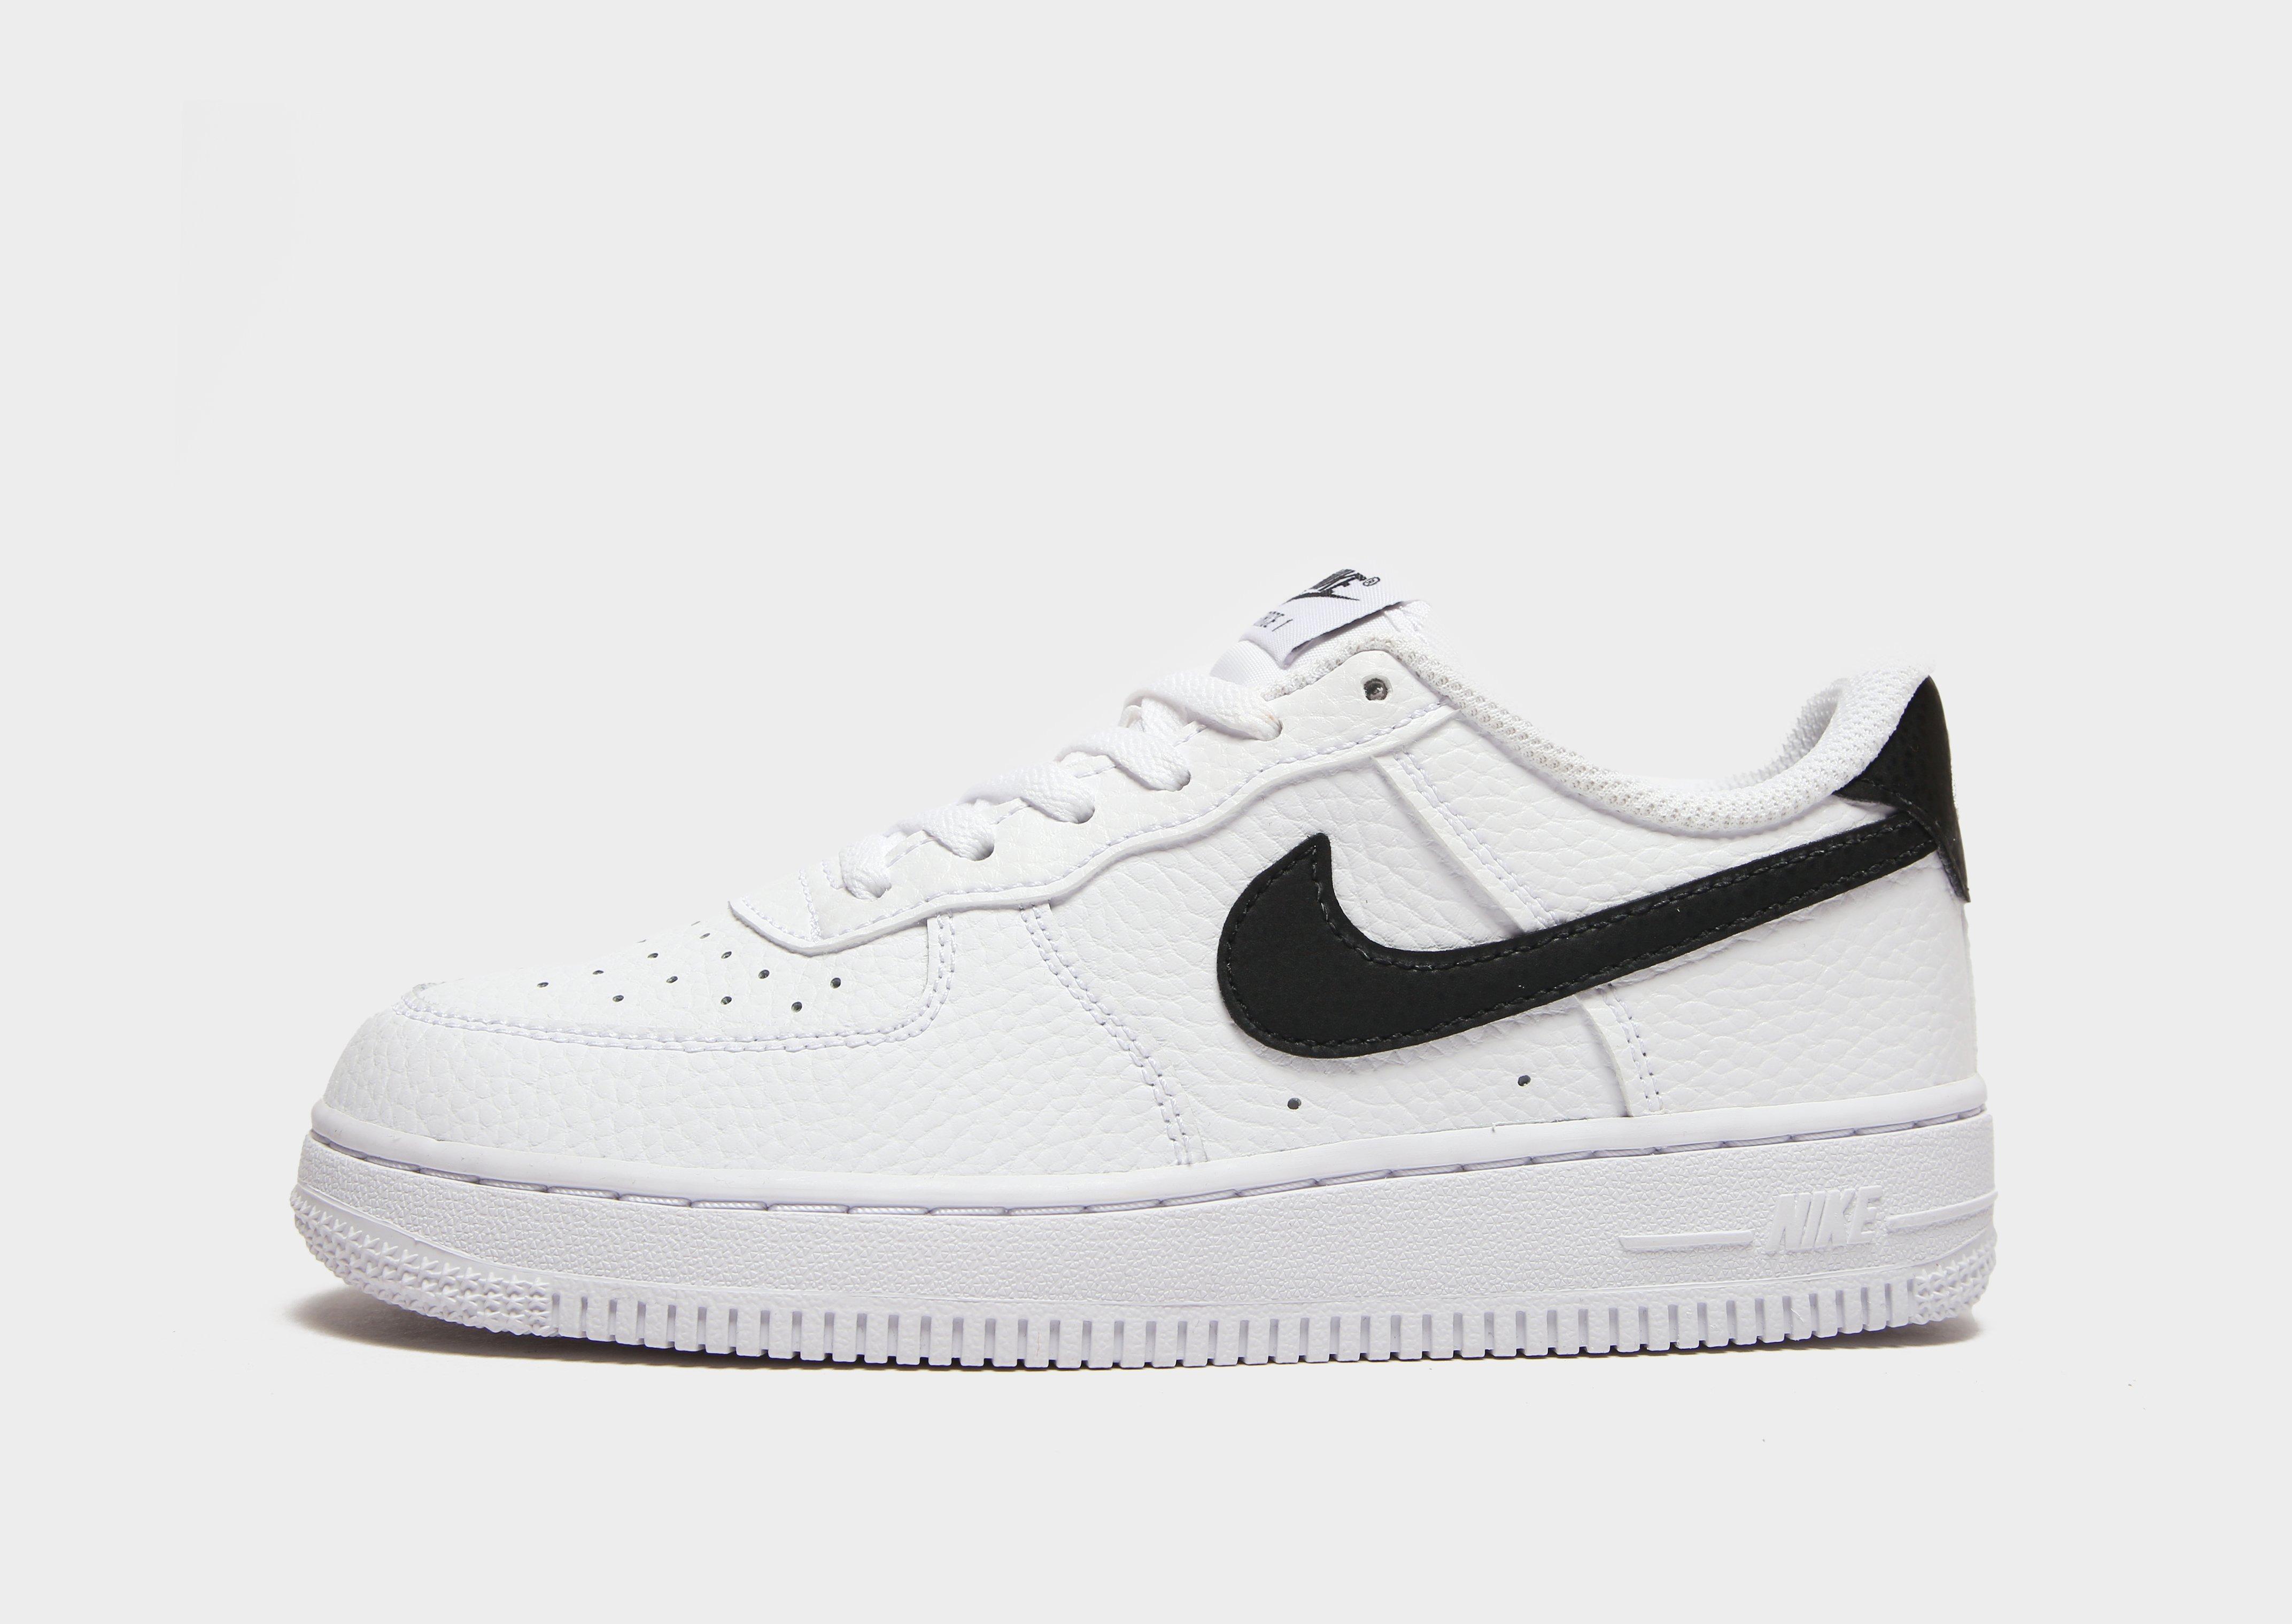 Nike Air Force 1 '07 LV8 Bambino | JD Sports